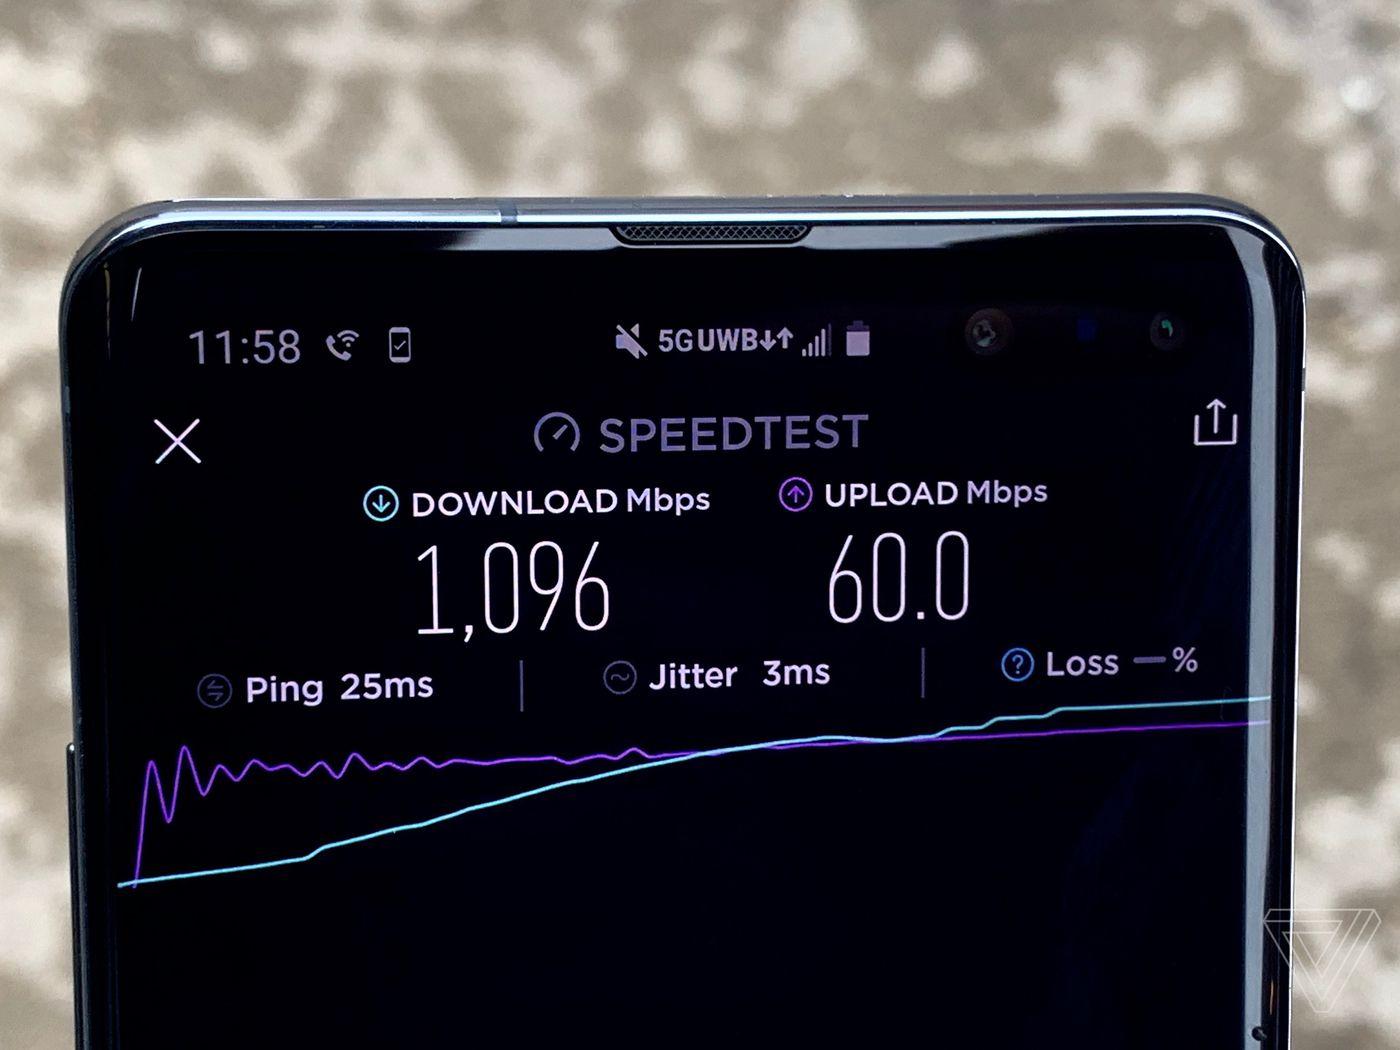 Verizon's 5g network is now hitting gigabit download speeds the.